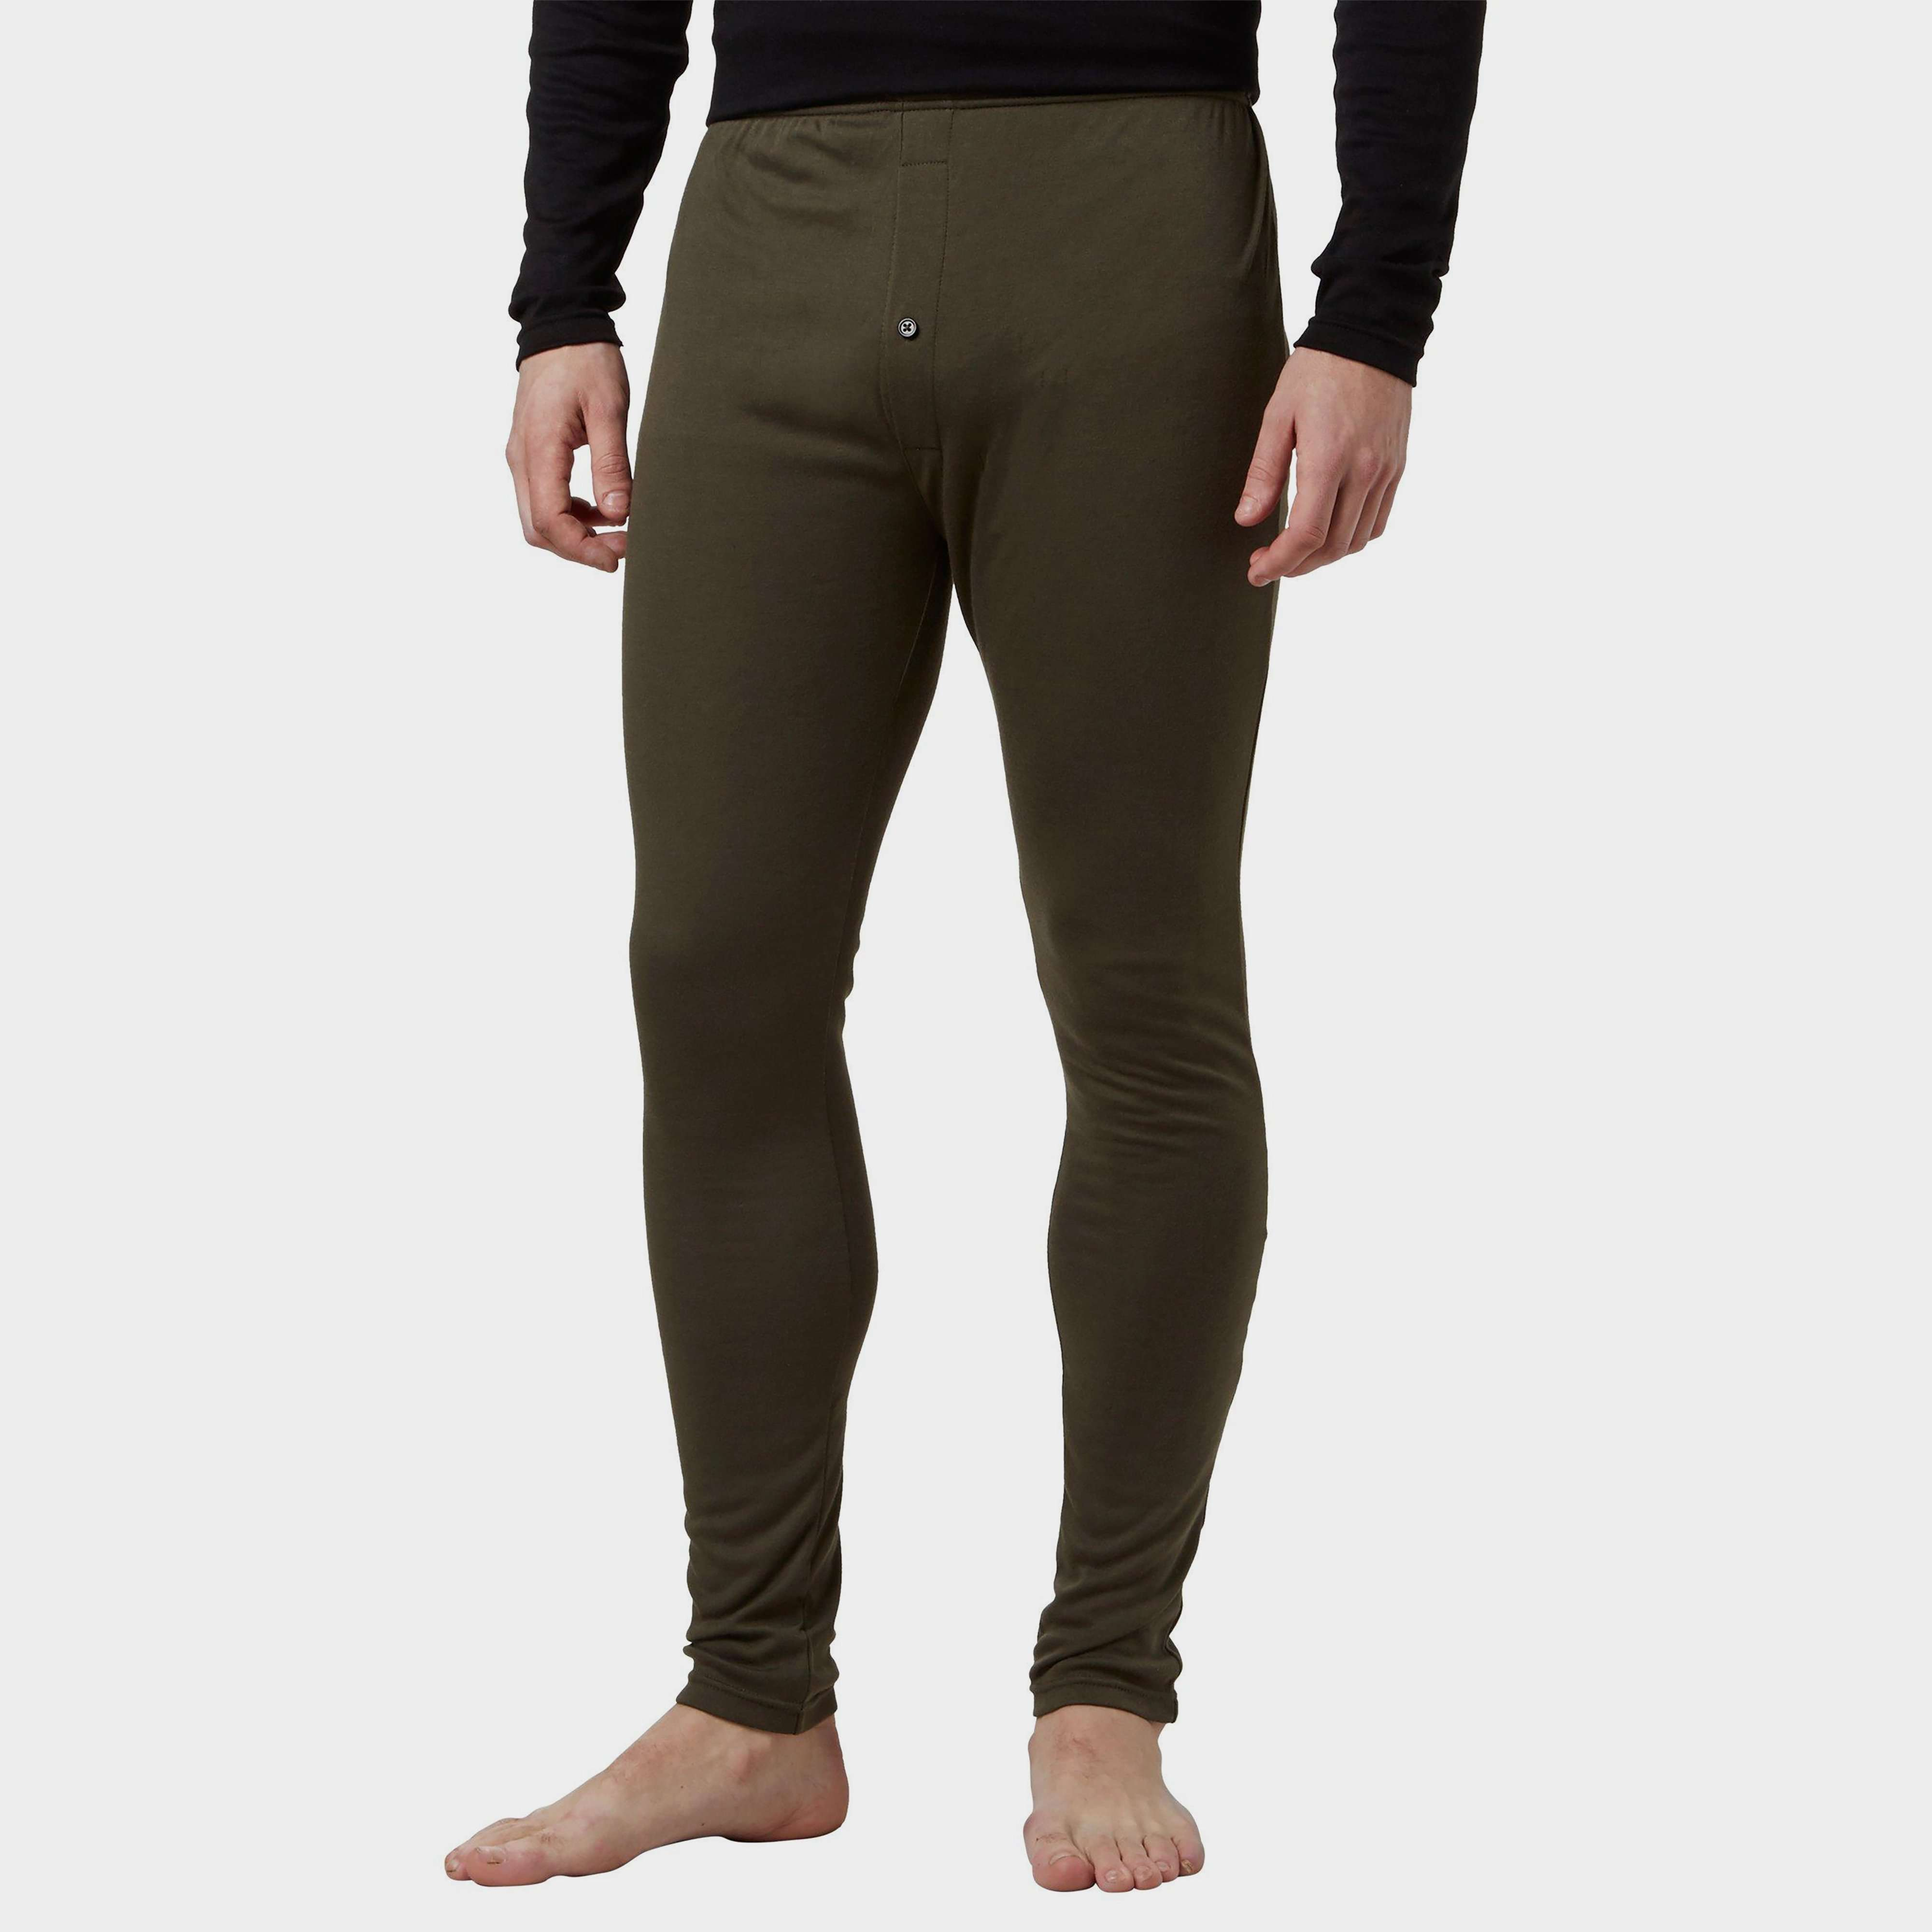 PETER STORM Men's Thermal Baselayer Pants